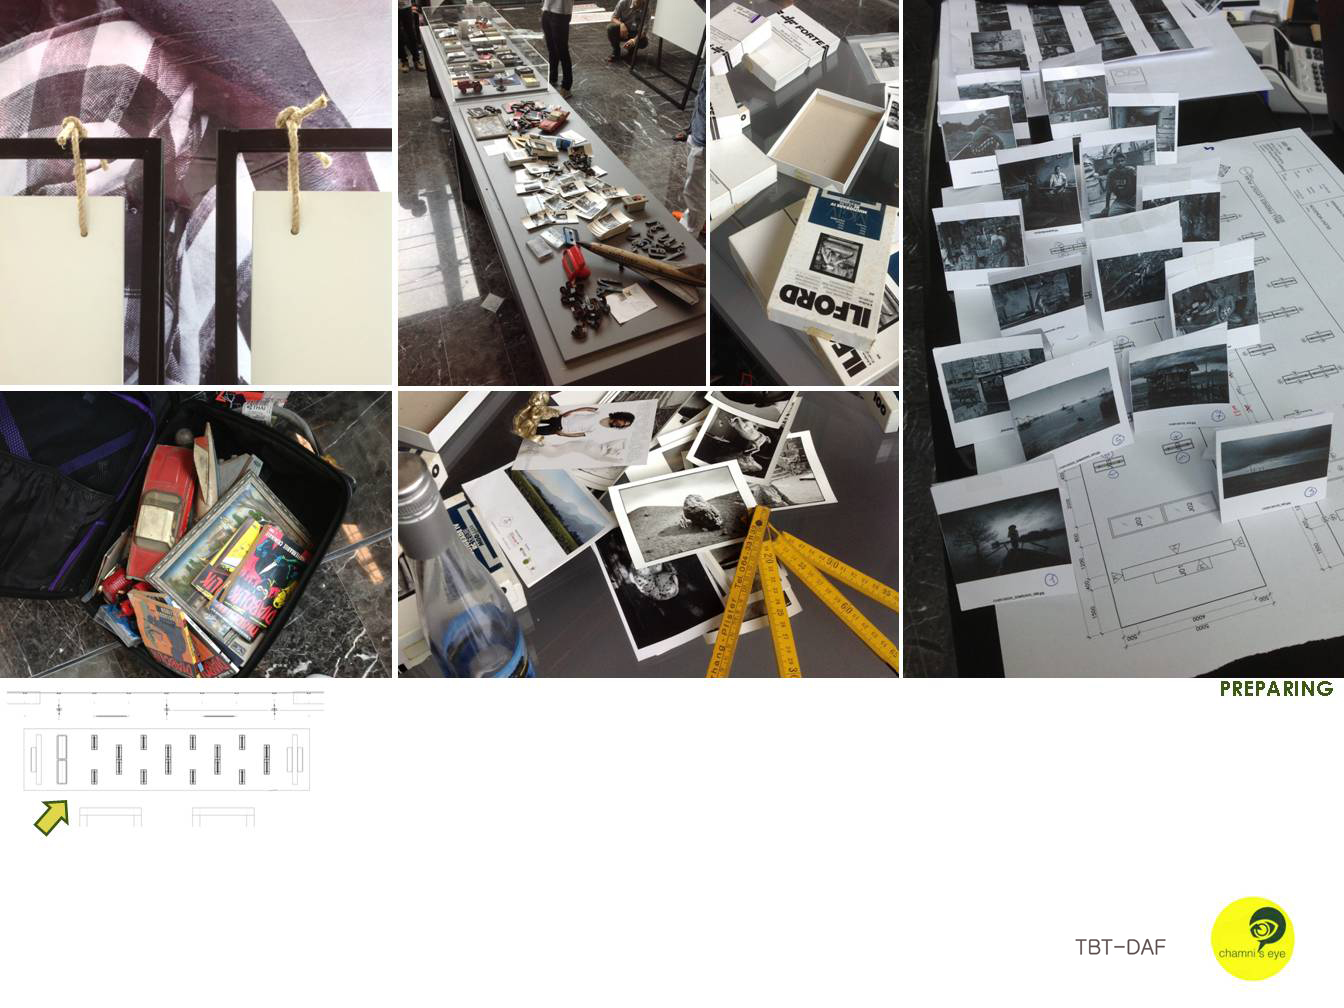 TBT-DAF interior design monsoon exhibition bw photo 22